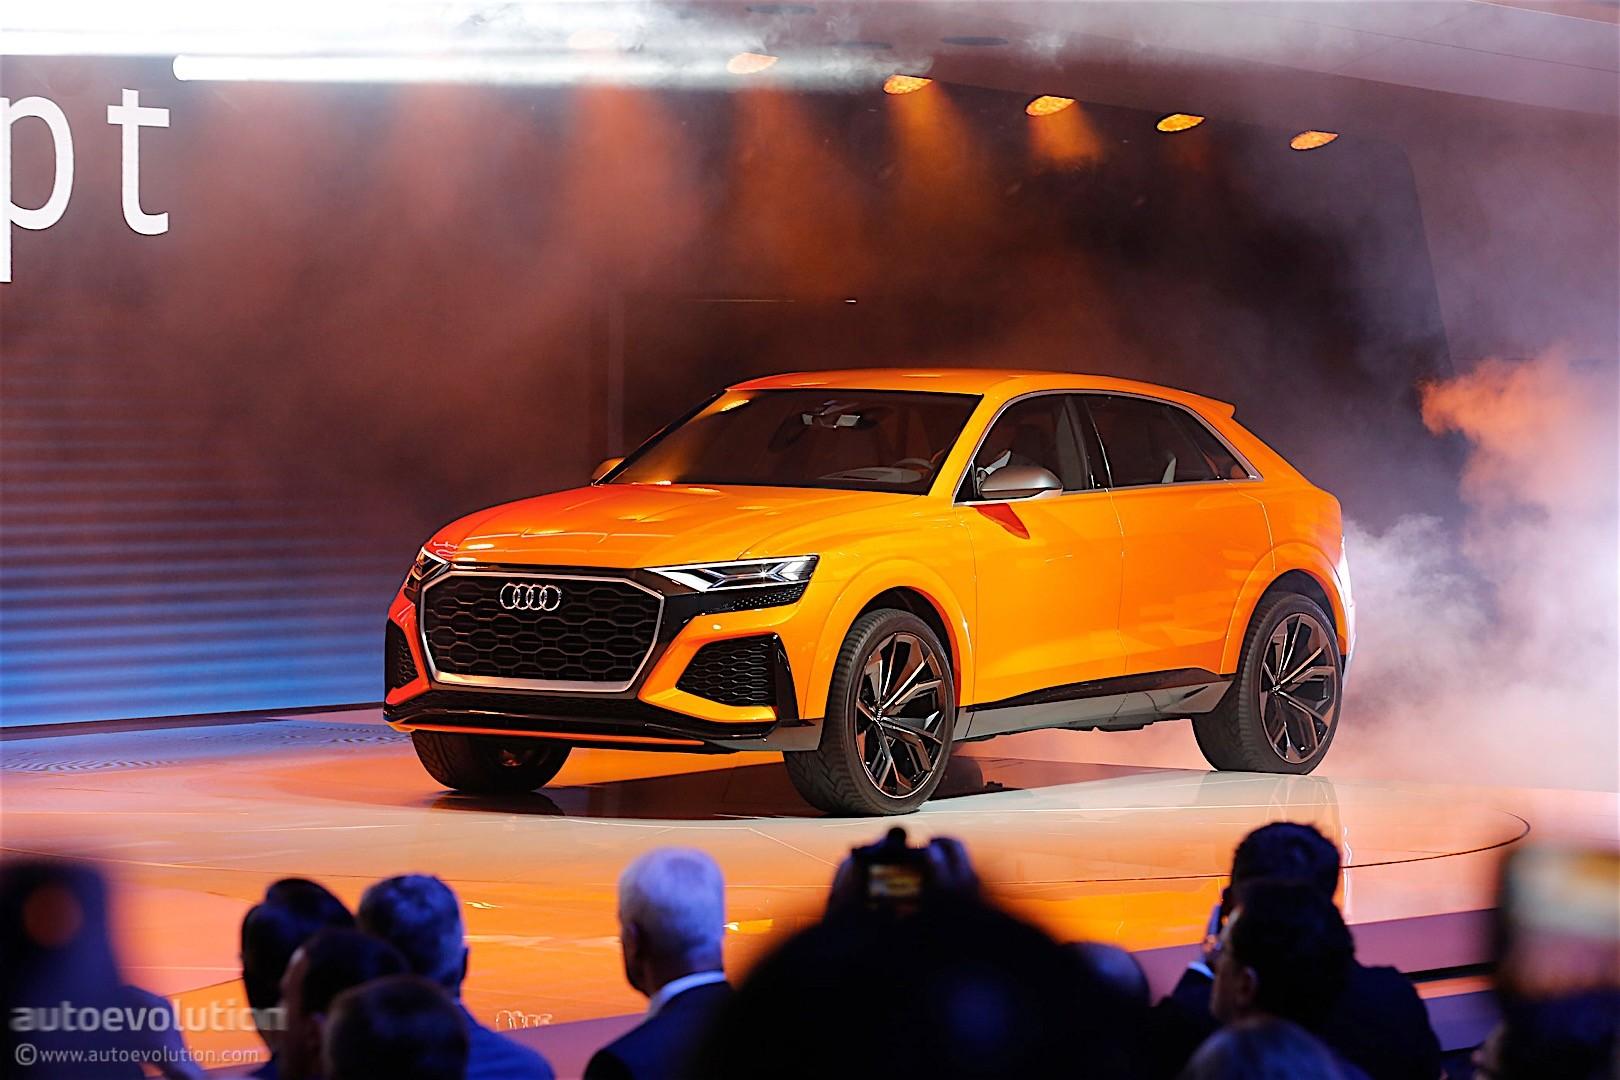 Audi Unveils Q8 Sport Concept A Mild Hybrid With 476 Hp And A 745 Mile Range Autoevolution